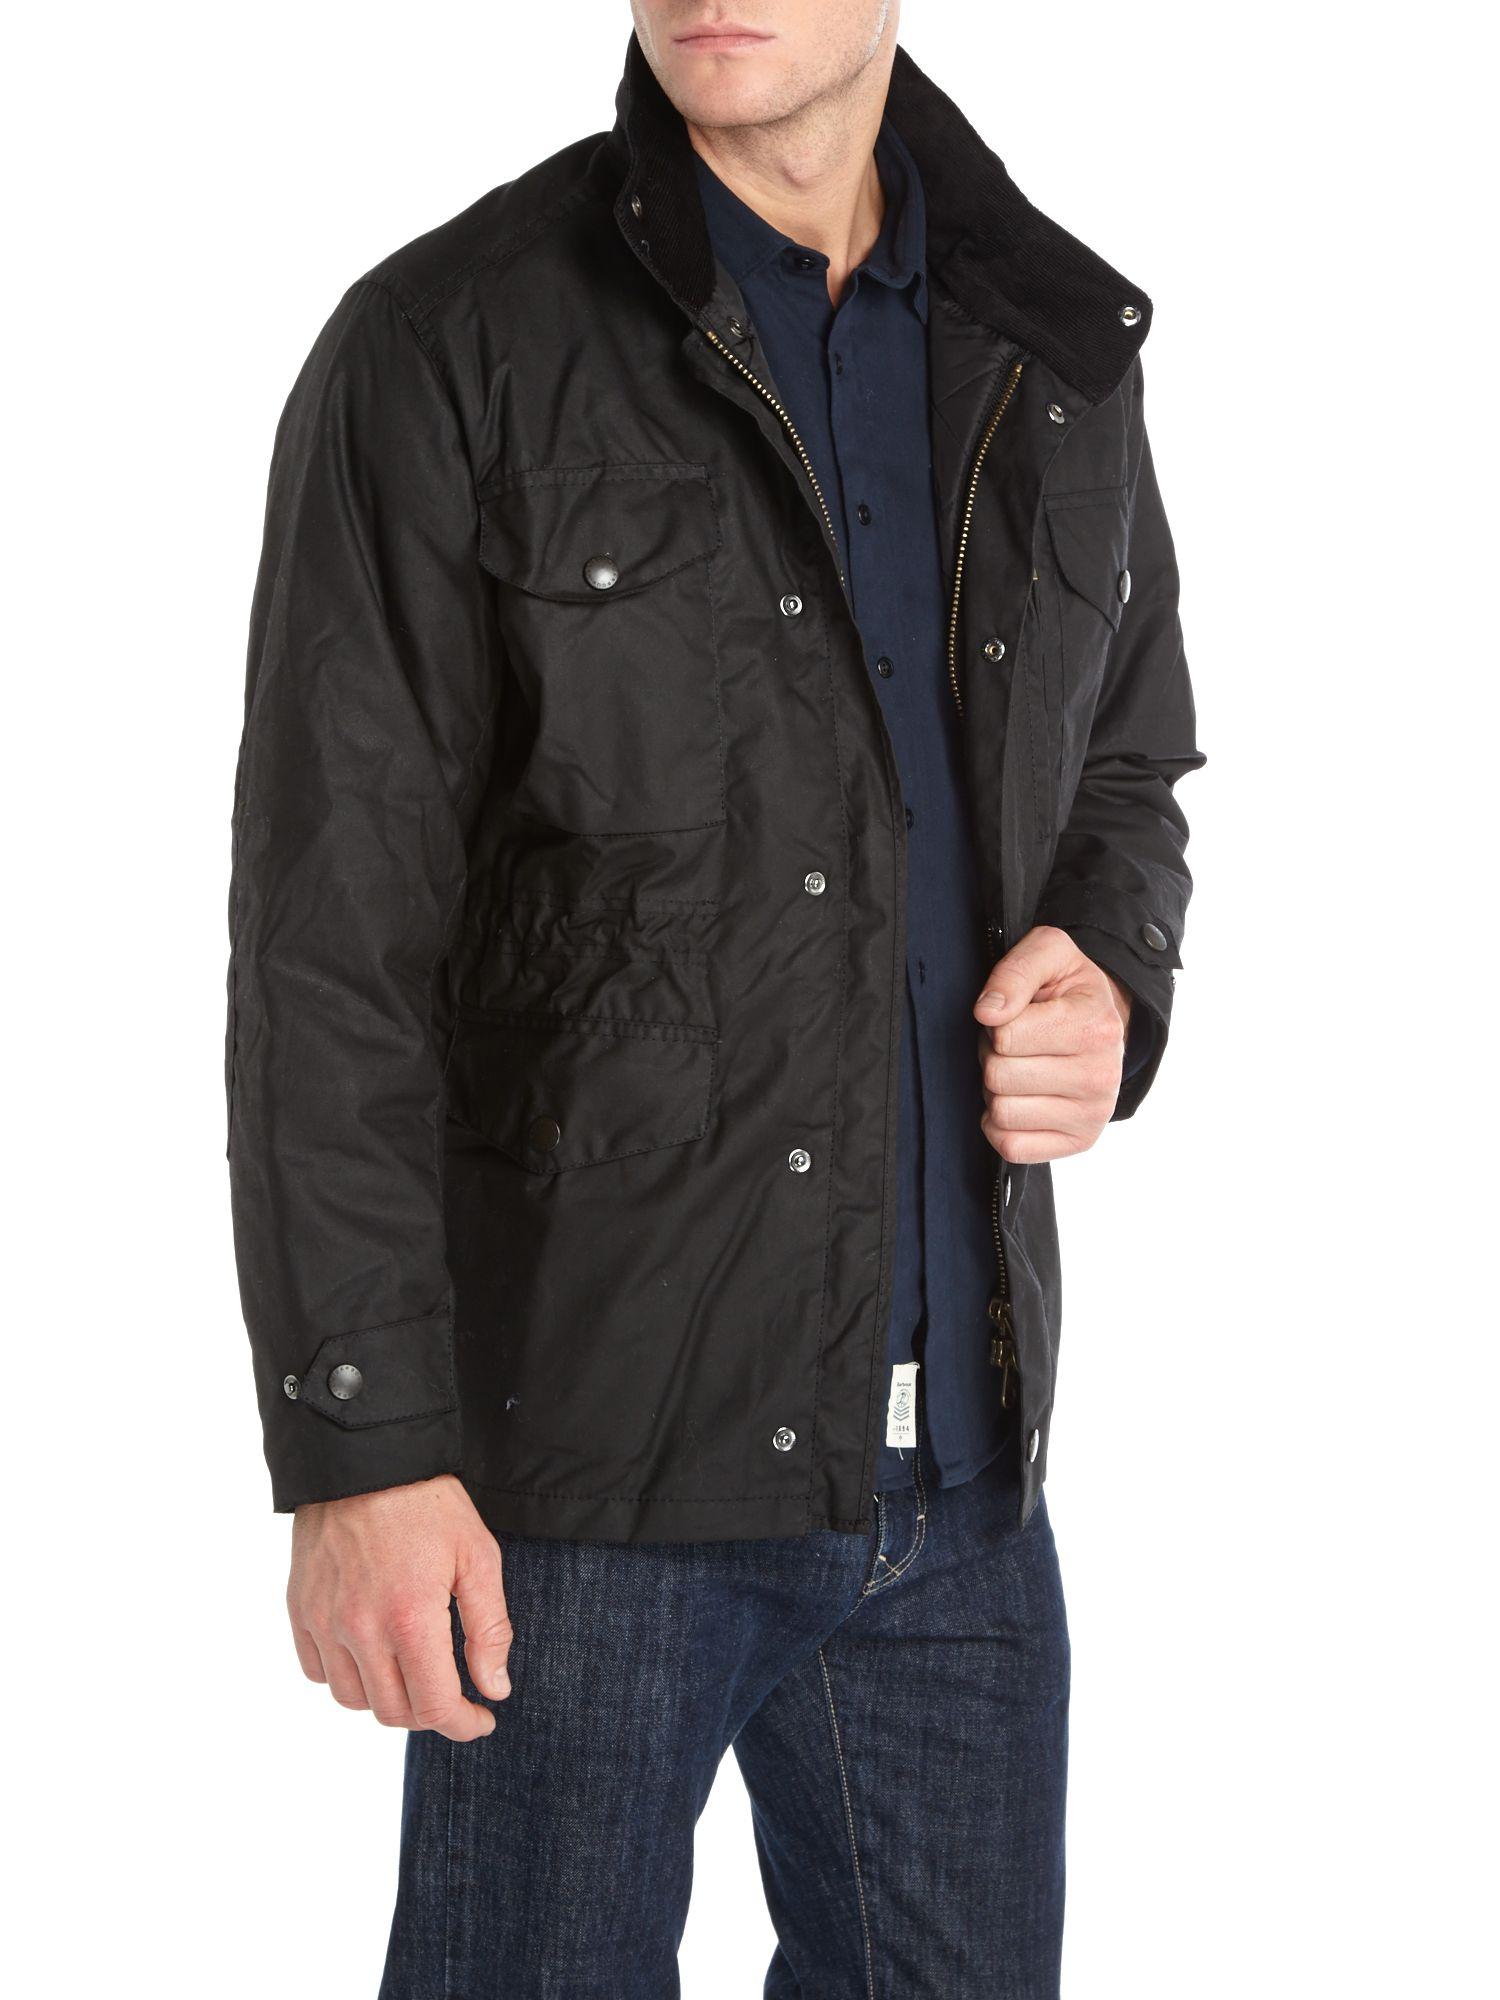 Barbour Sapper Jacket >> Barbour Cotton Wax Sapper Jacket in Black for Men - Lyst